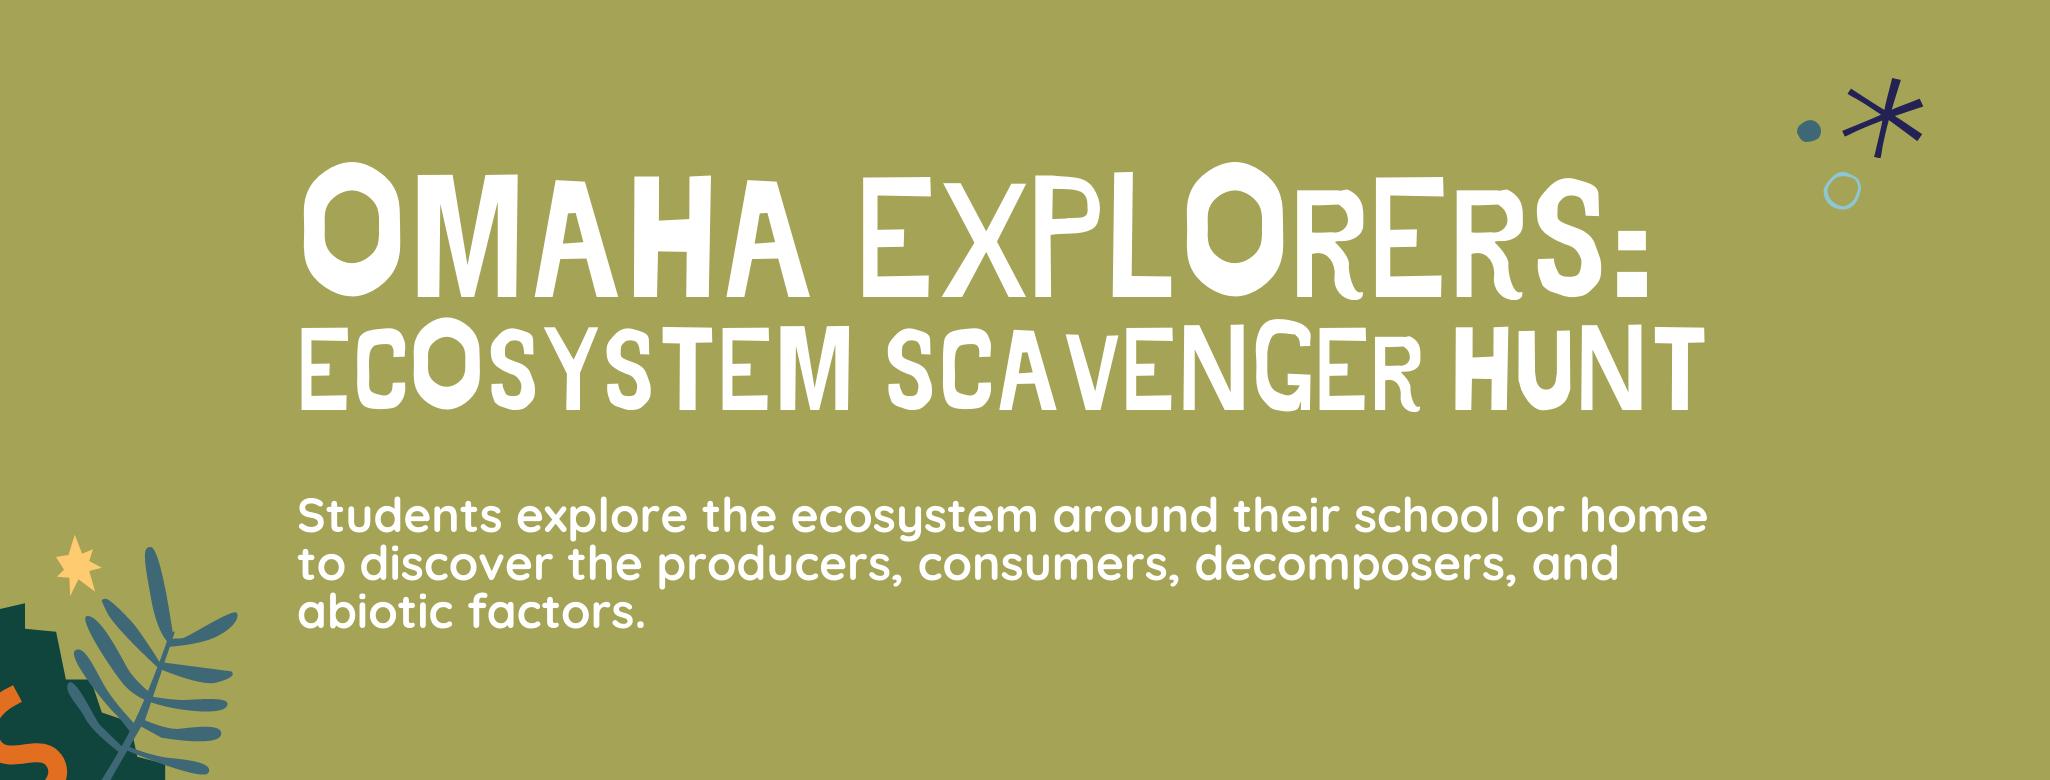 Omaha Explorers: Ecosystem Scavenger Hunt